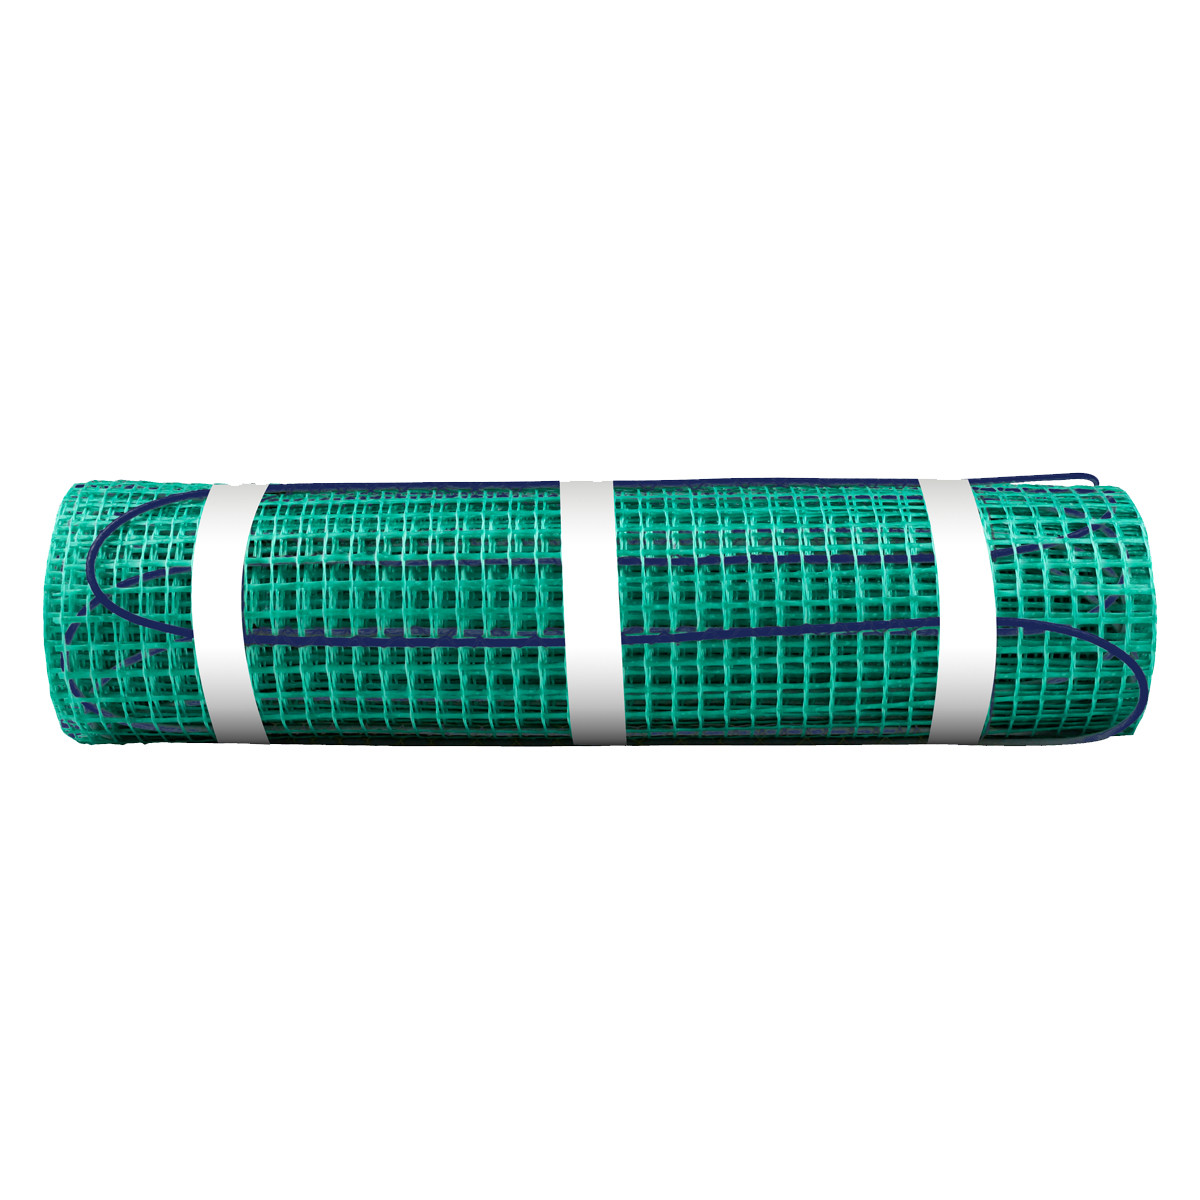 WarmlyYours TRT240-3.0x43 TempZone 240V 8.1A 3 Foot x 43 Foot Flex Roll